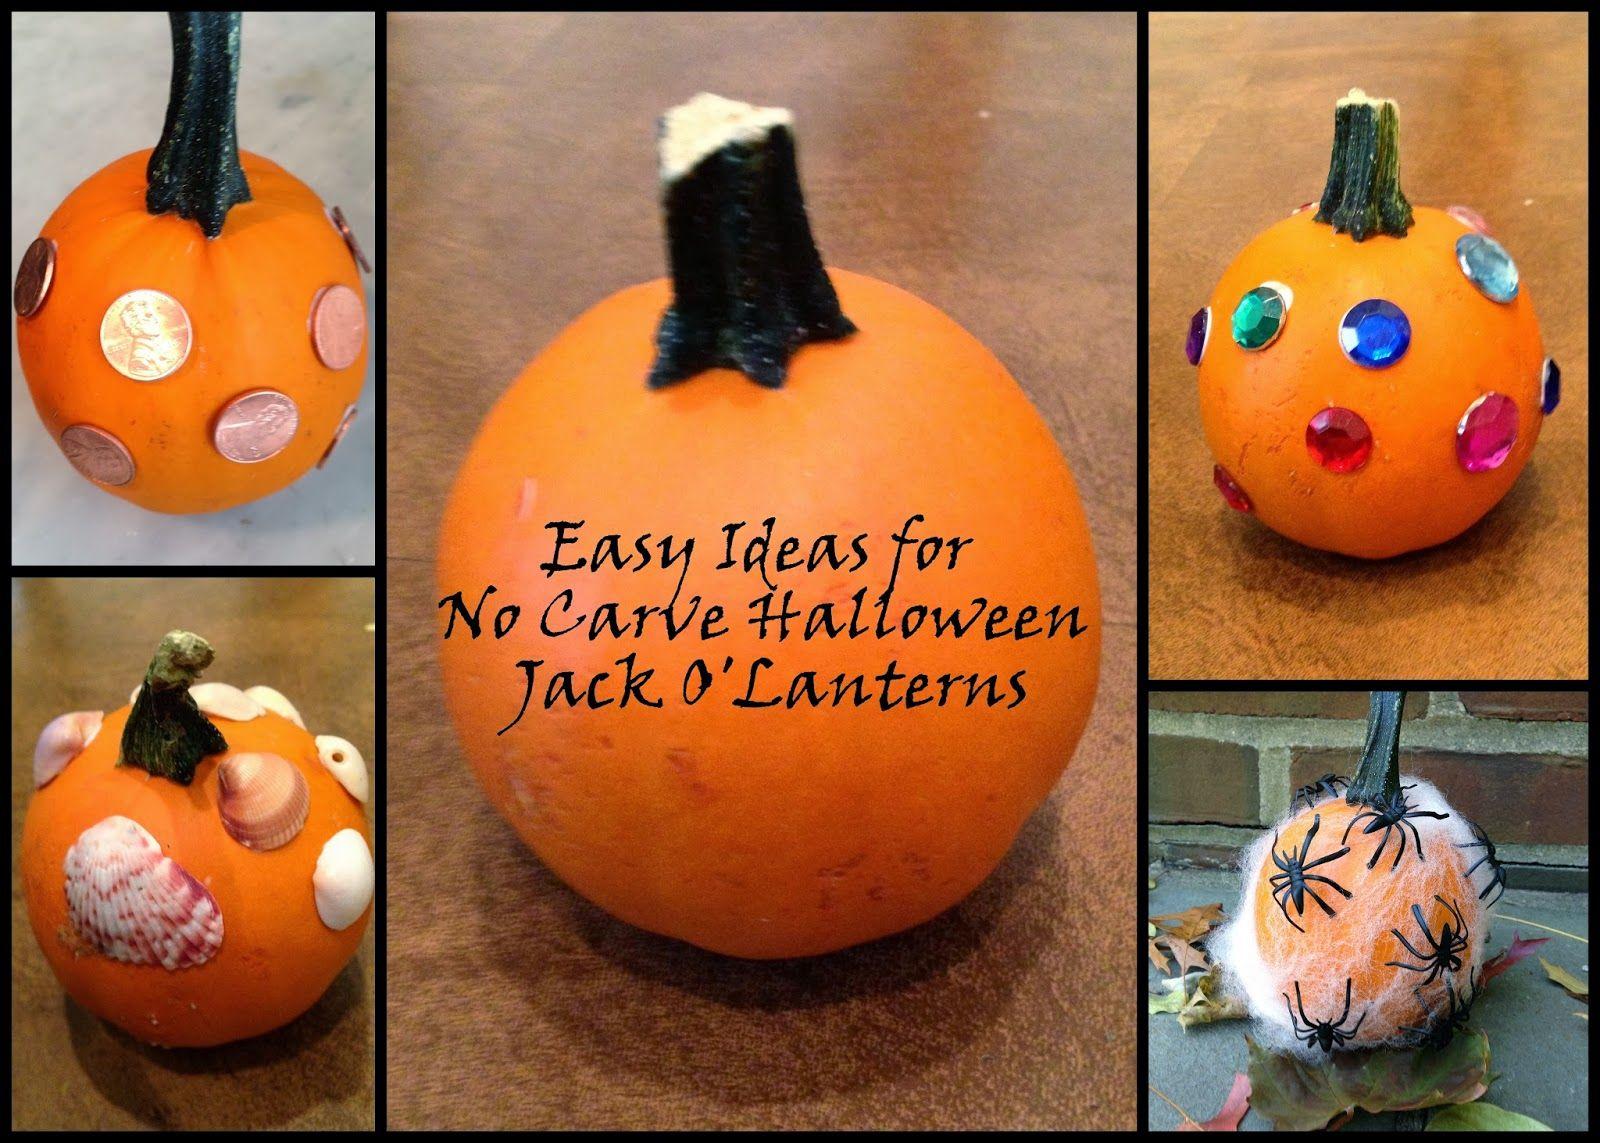 No carve pumpkin decorating ideas guru koala pumpkin